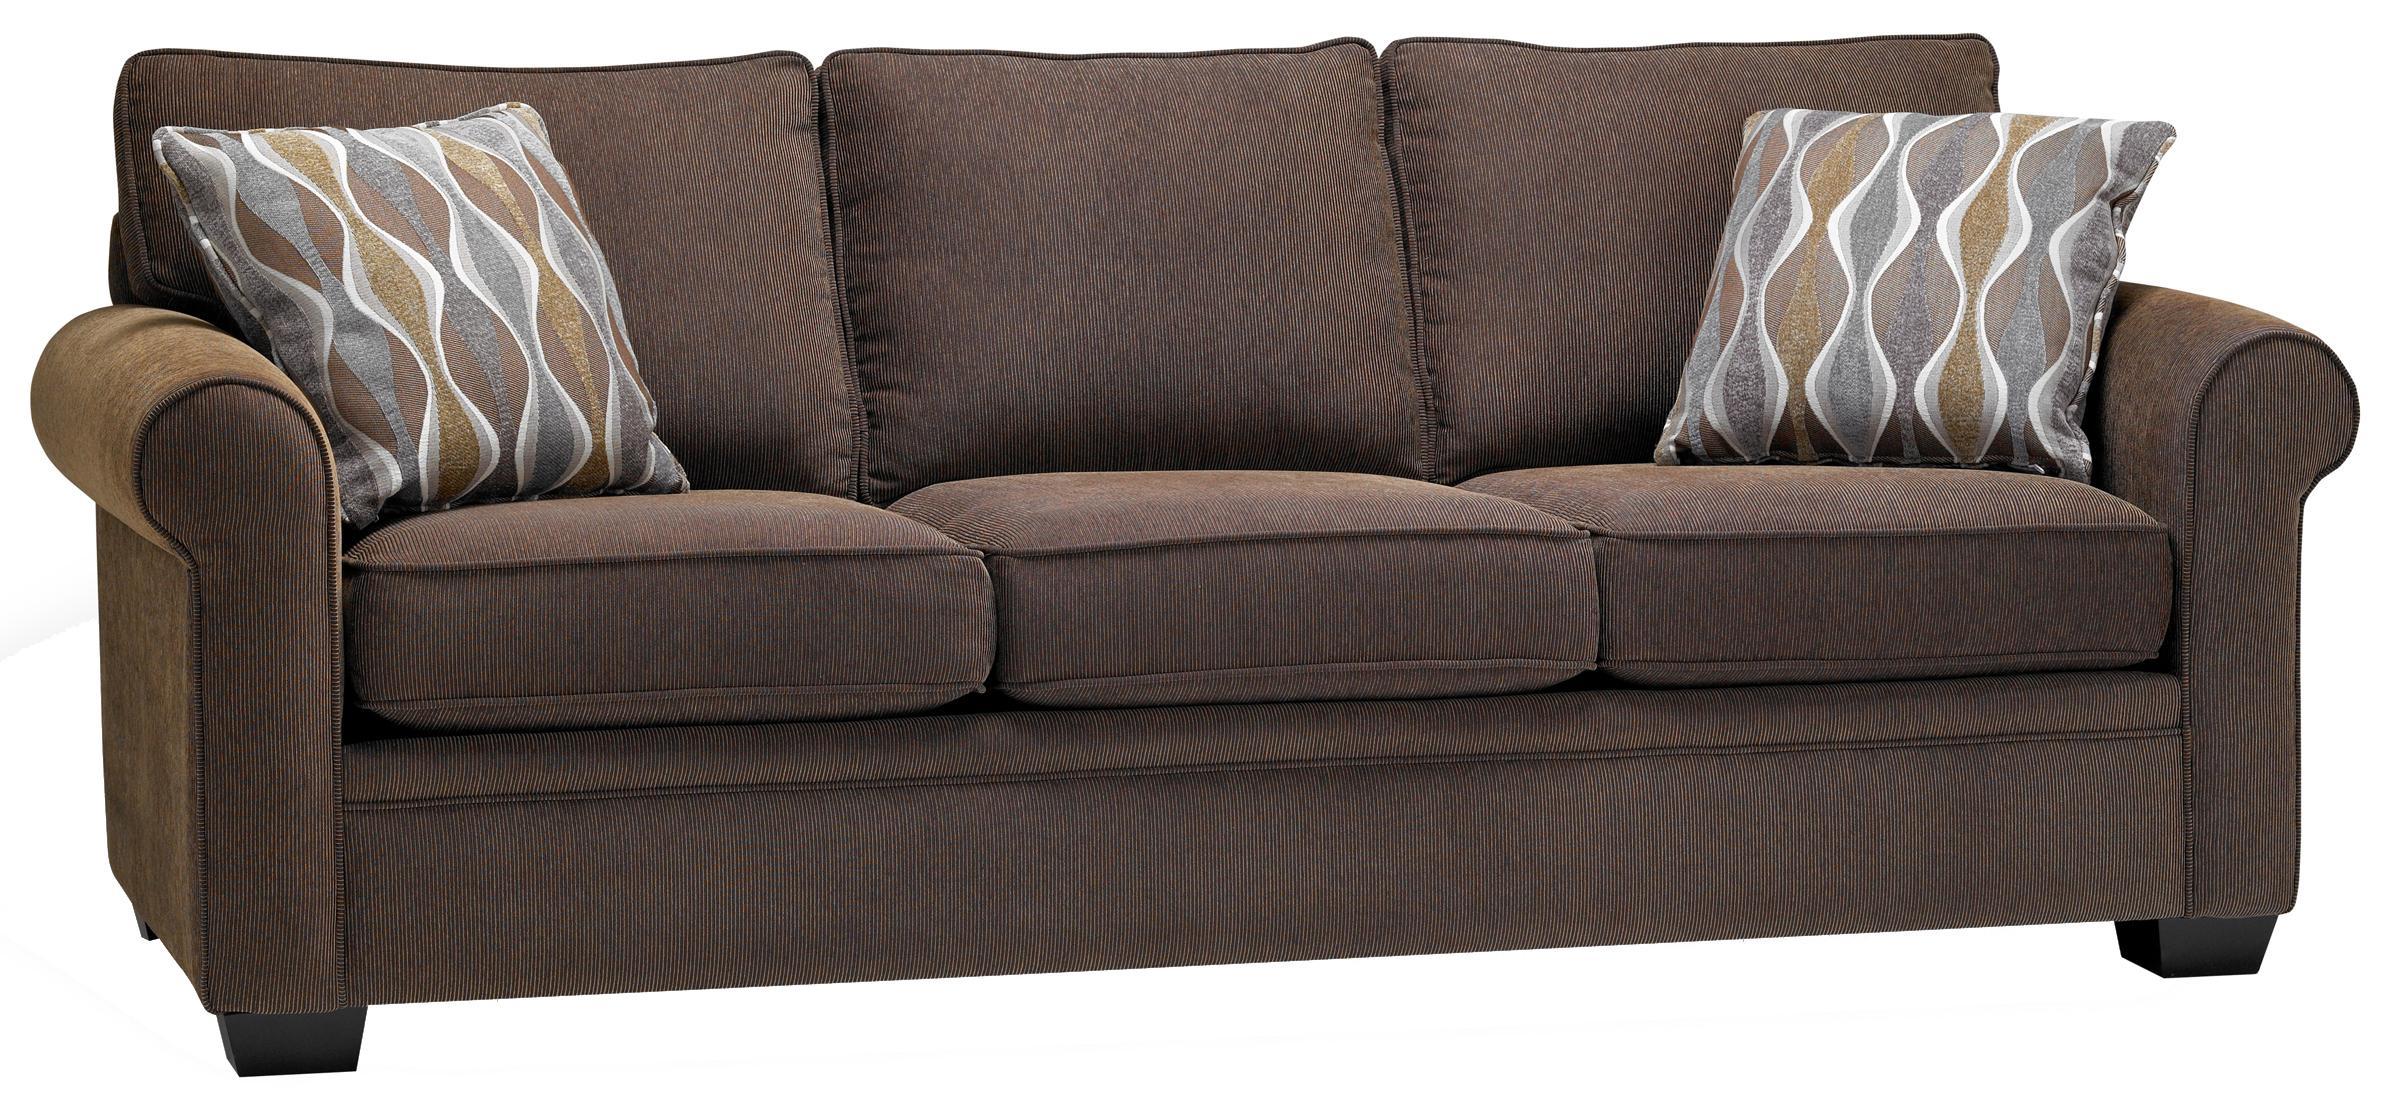 stylus sofa stylus 4320sofa ALC1I3B0